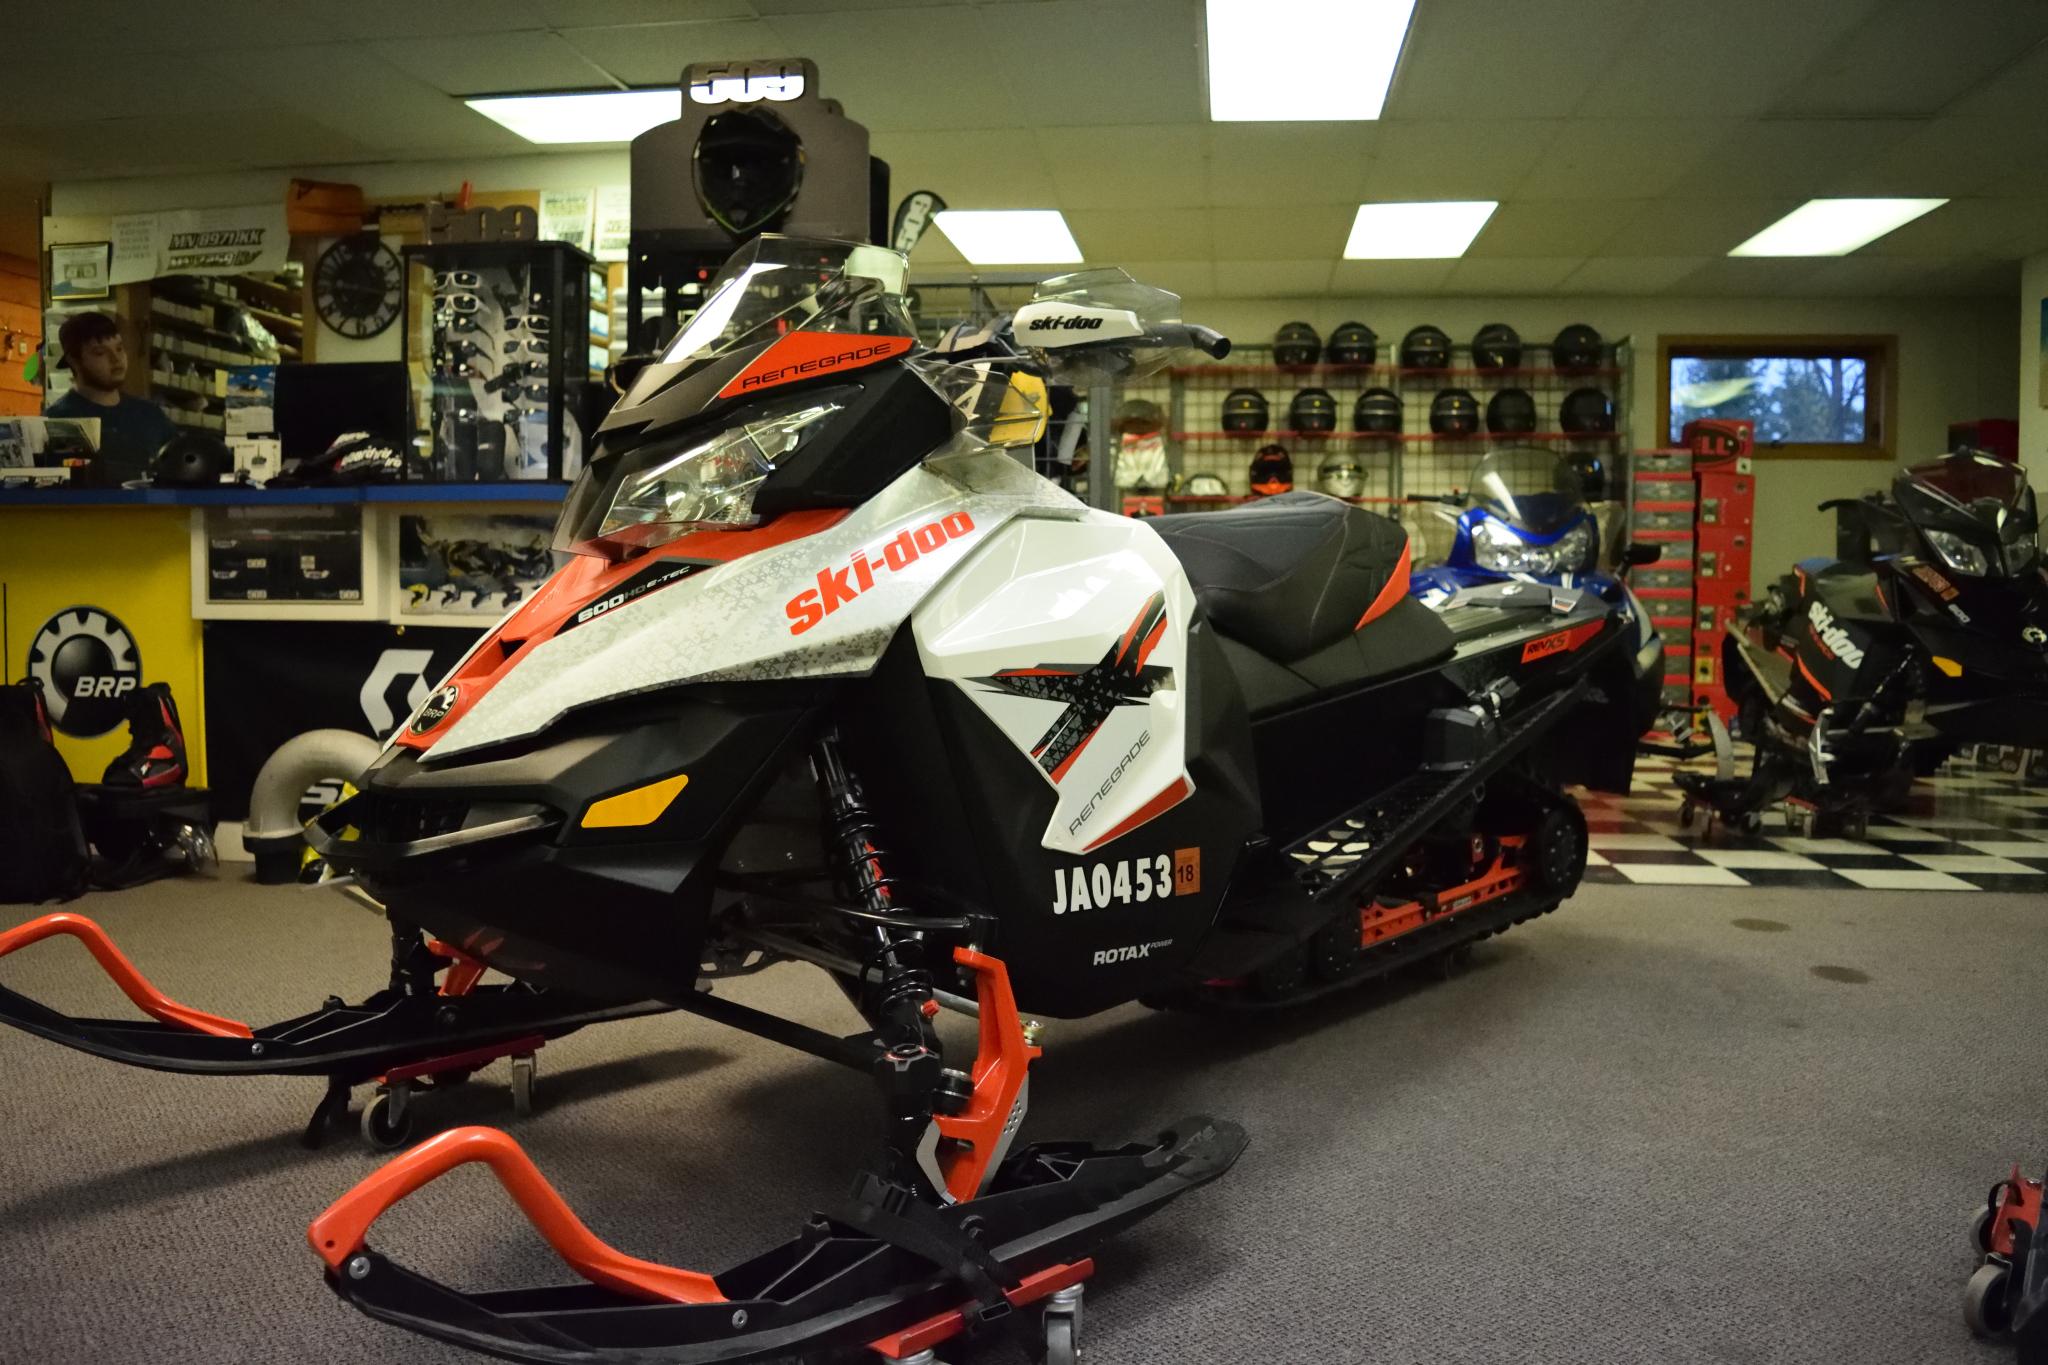 2016 Ski Doo Renegade X 600 HO E-TEC Seaberg Motorsports Crosslake Minnesota side